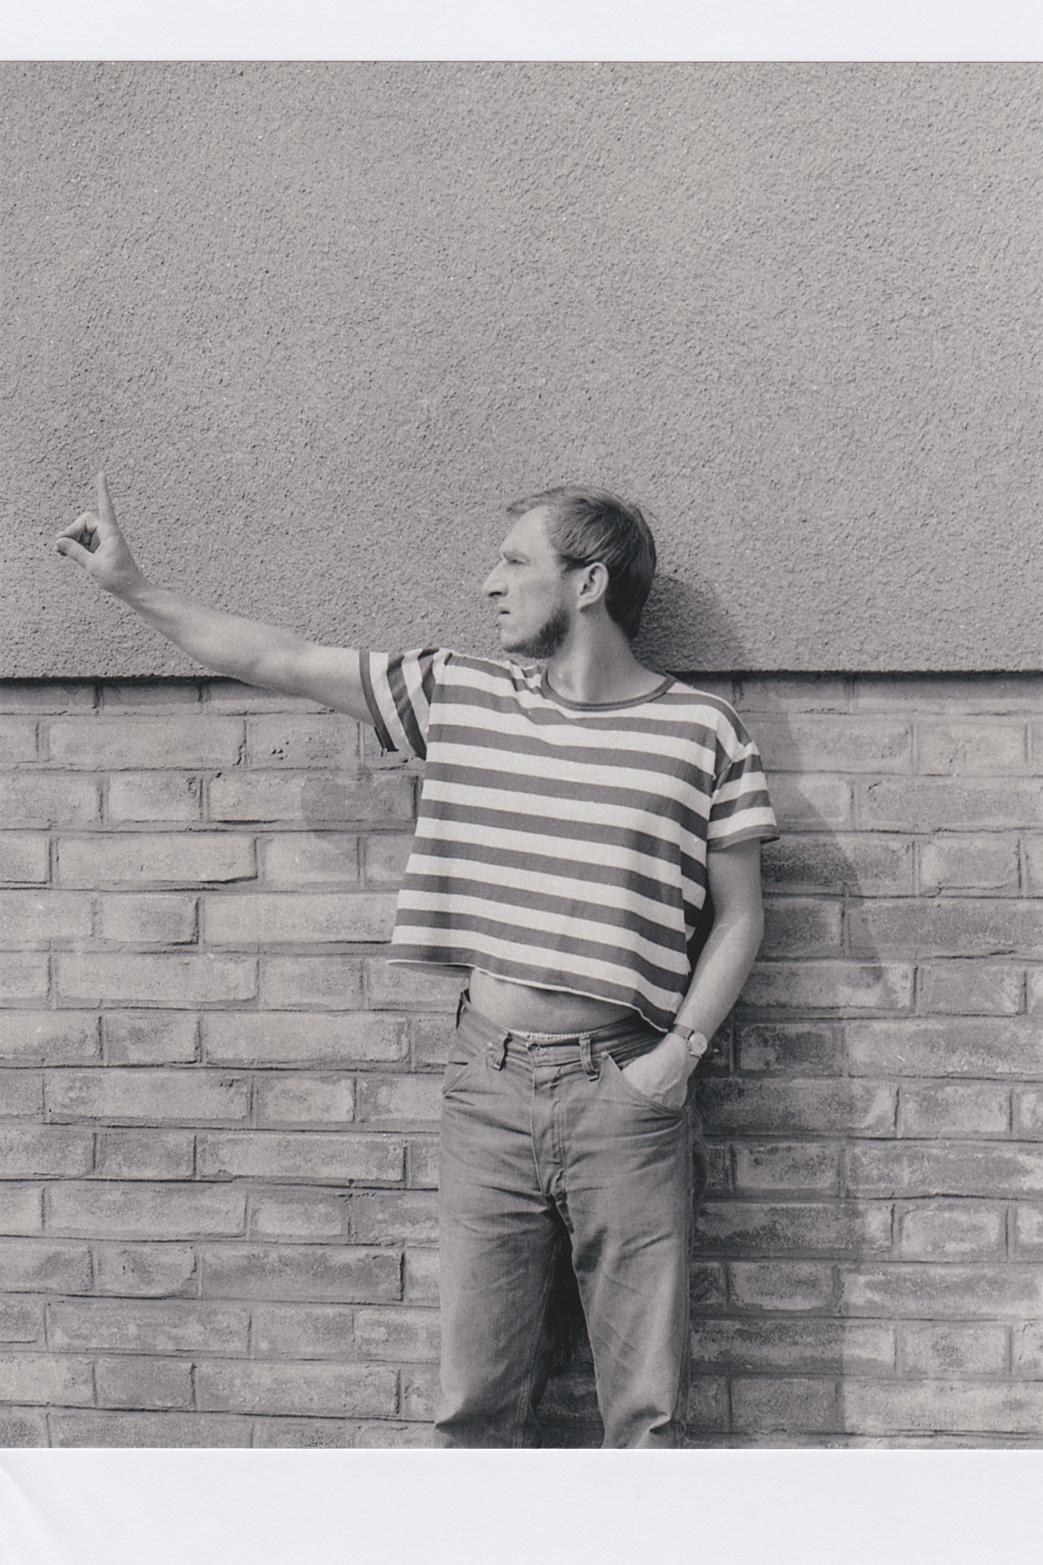 Karel Miler, Watching, 1972. Courtesy of SVIT Prague and Tenderpixel.